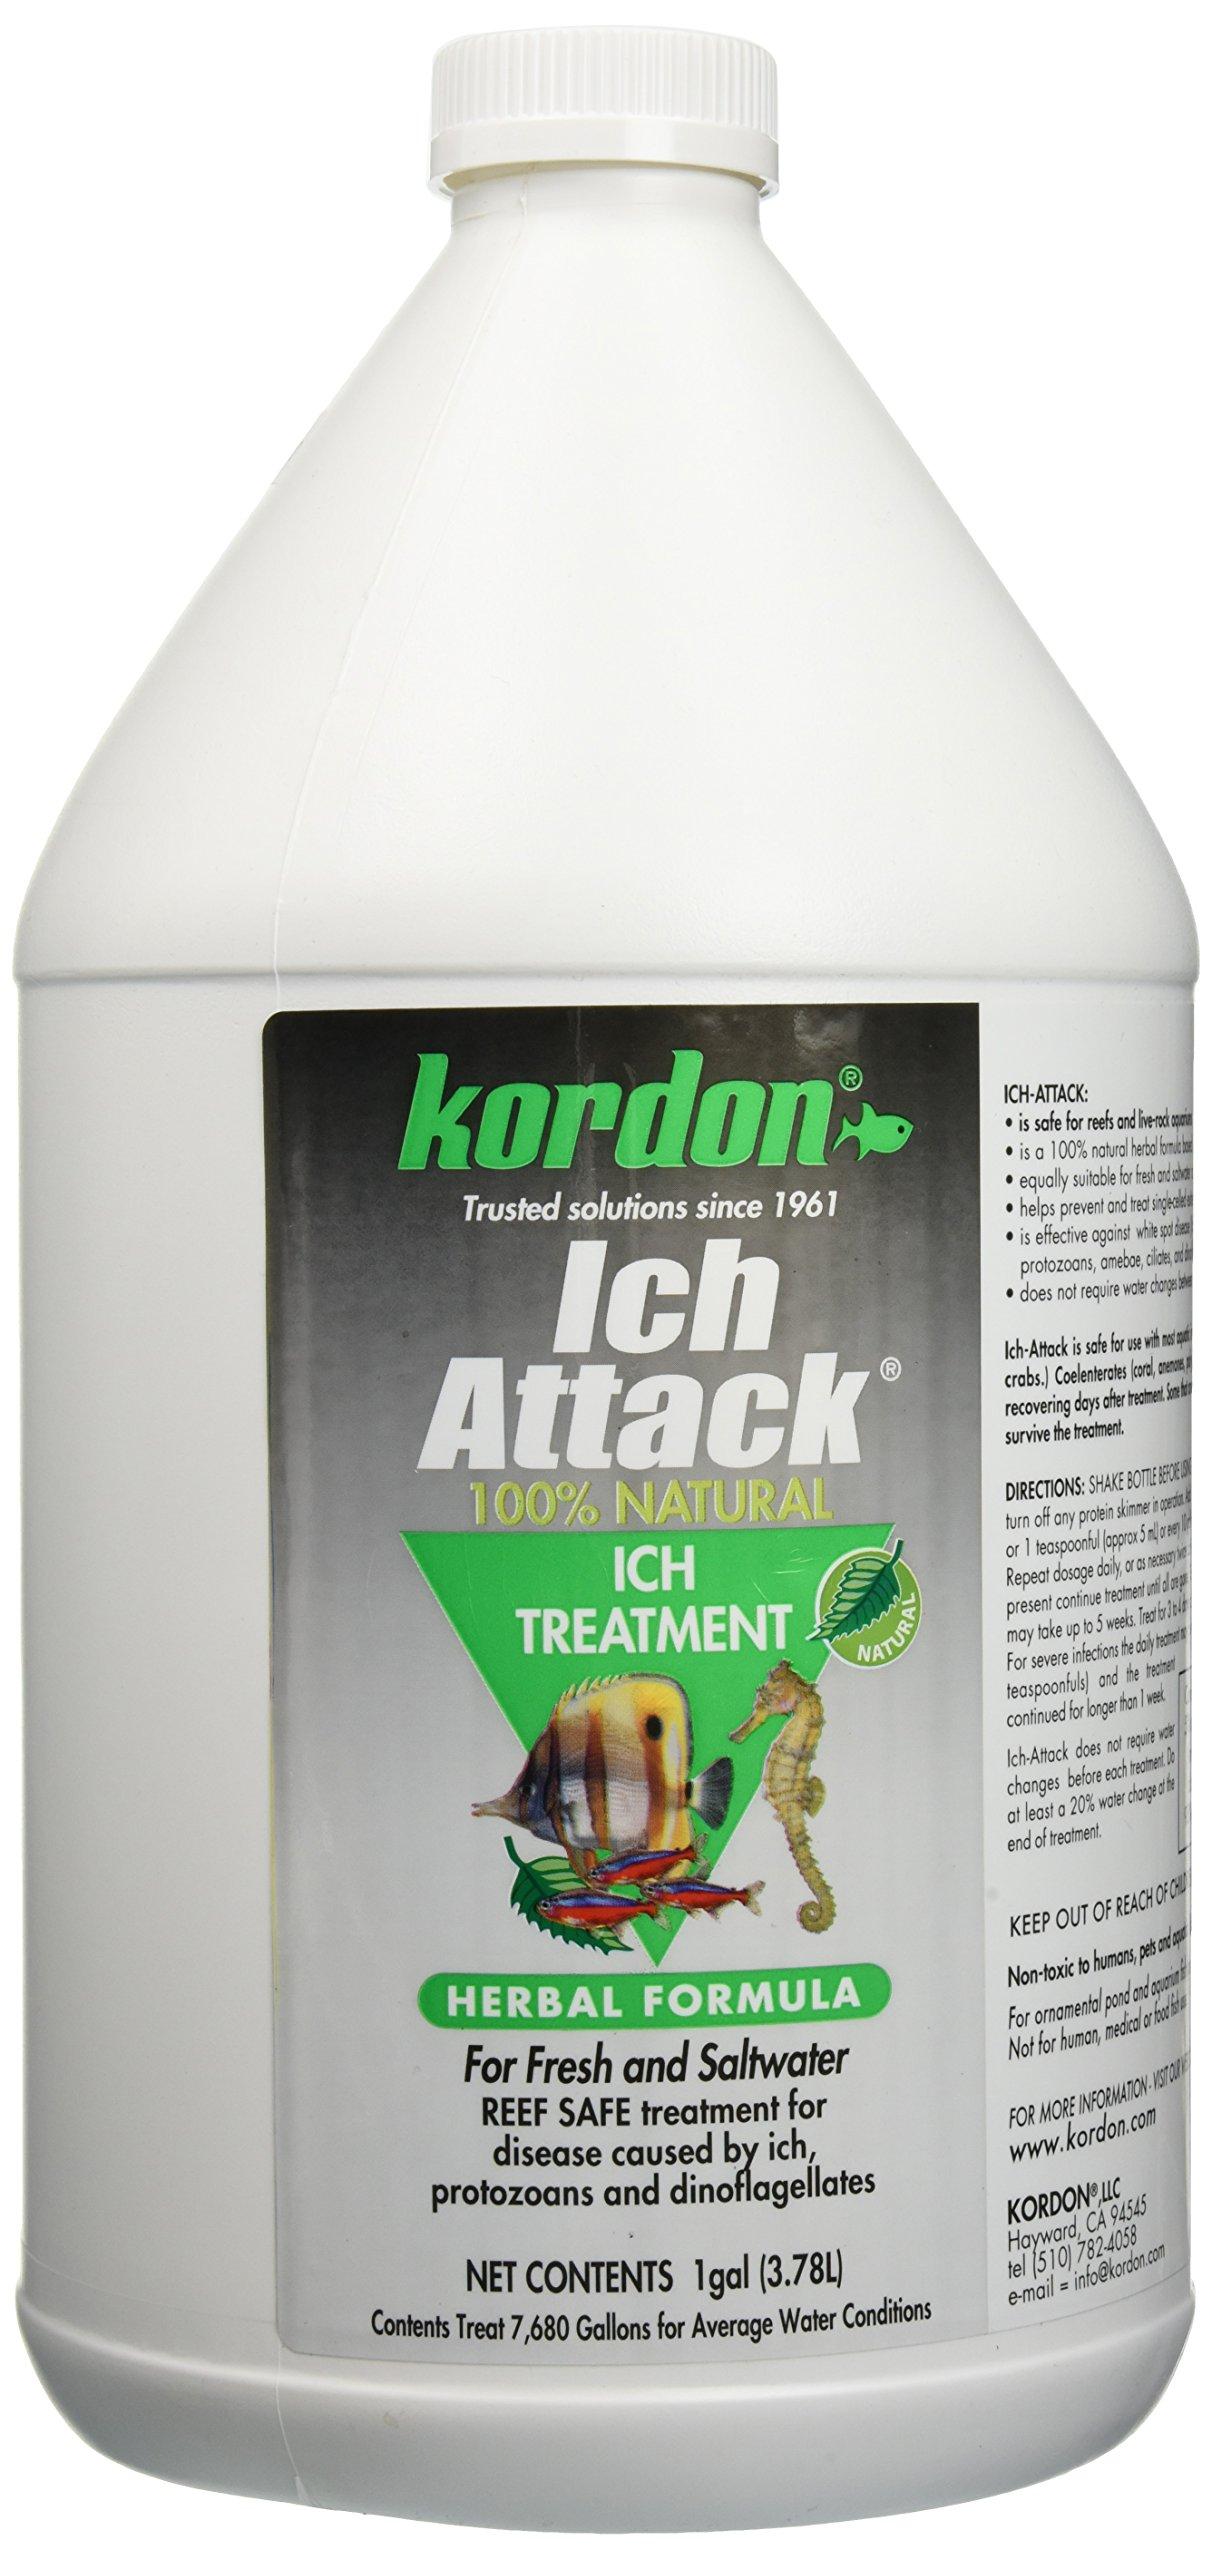 KORDON  #39462  Ich Attack for Aquarium, 1-Gallon ONLY by Kordon